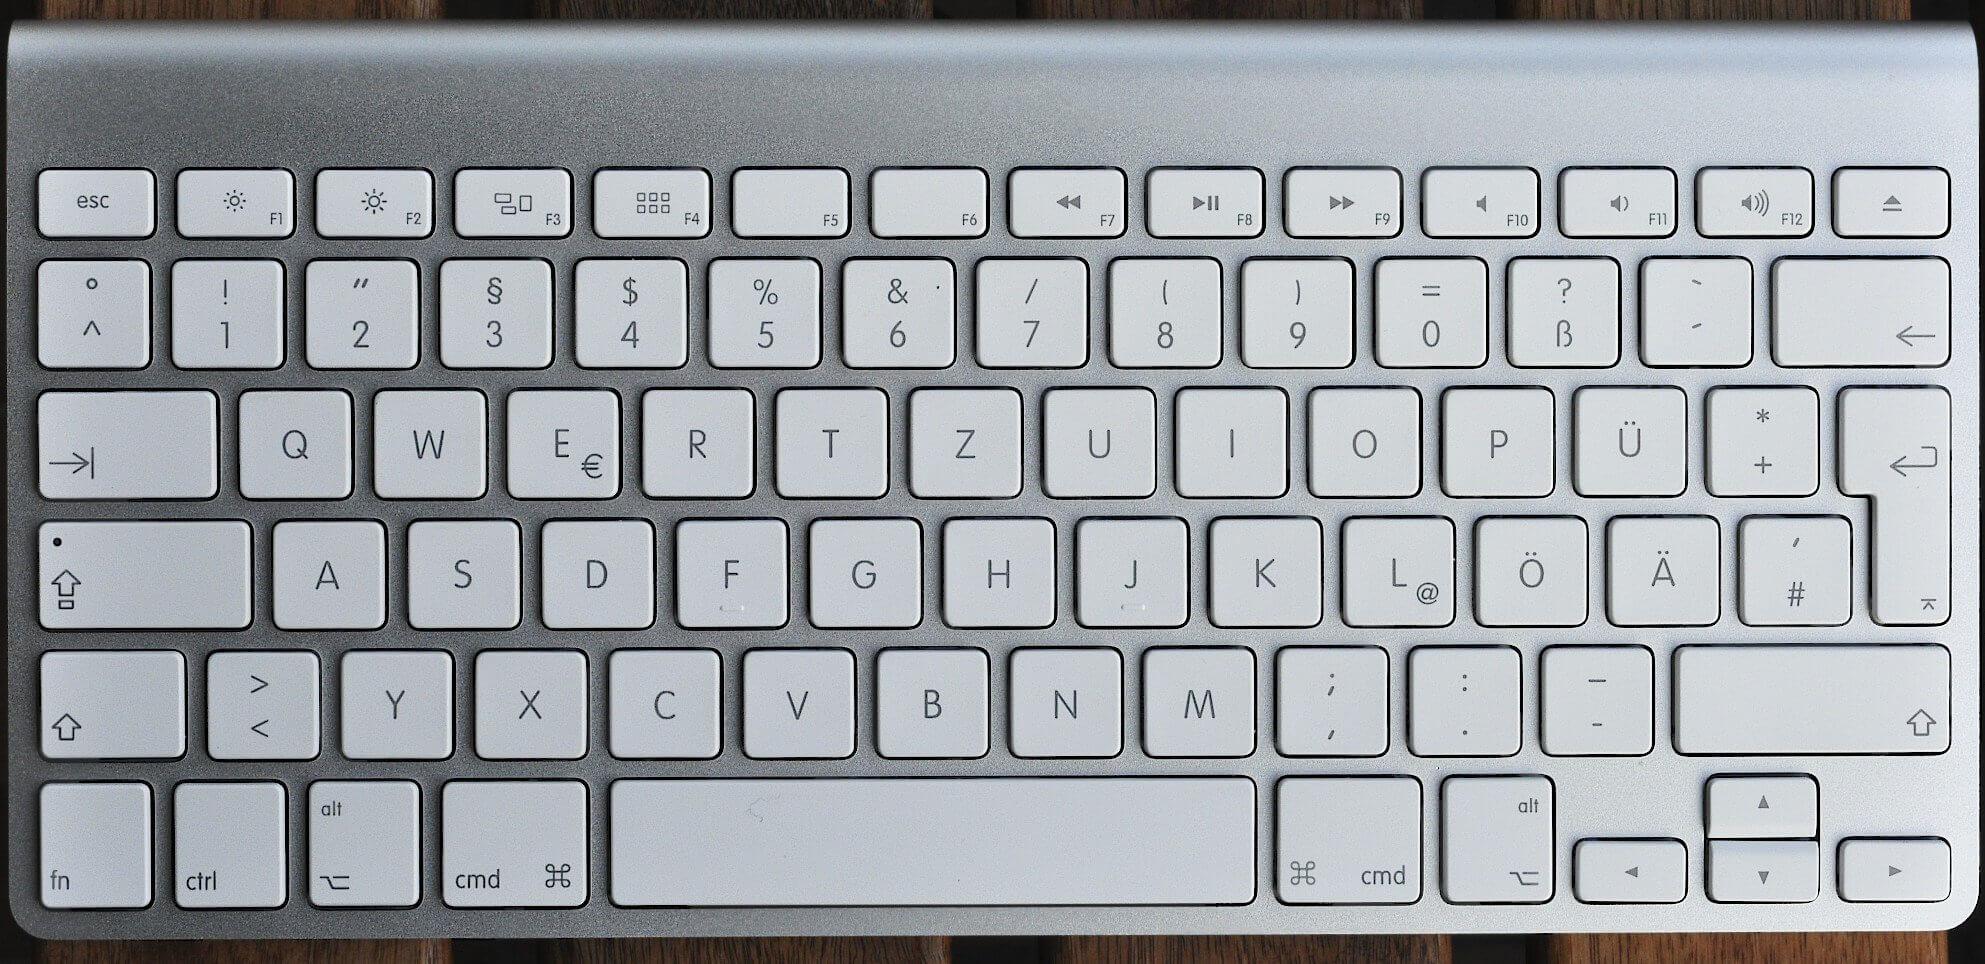 tastenbelegung mac tastatur shortcuts und tastenk rzel. Black Bedroom Furniture Sets. Home Design Ideas